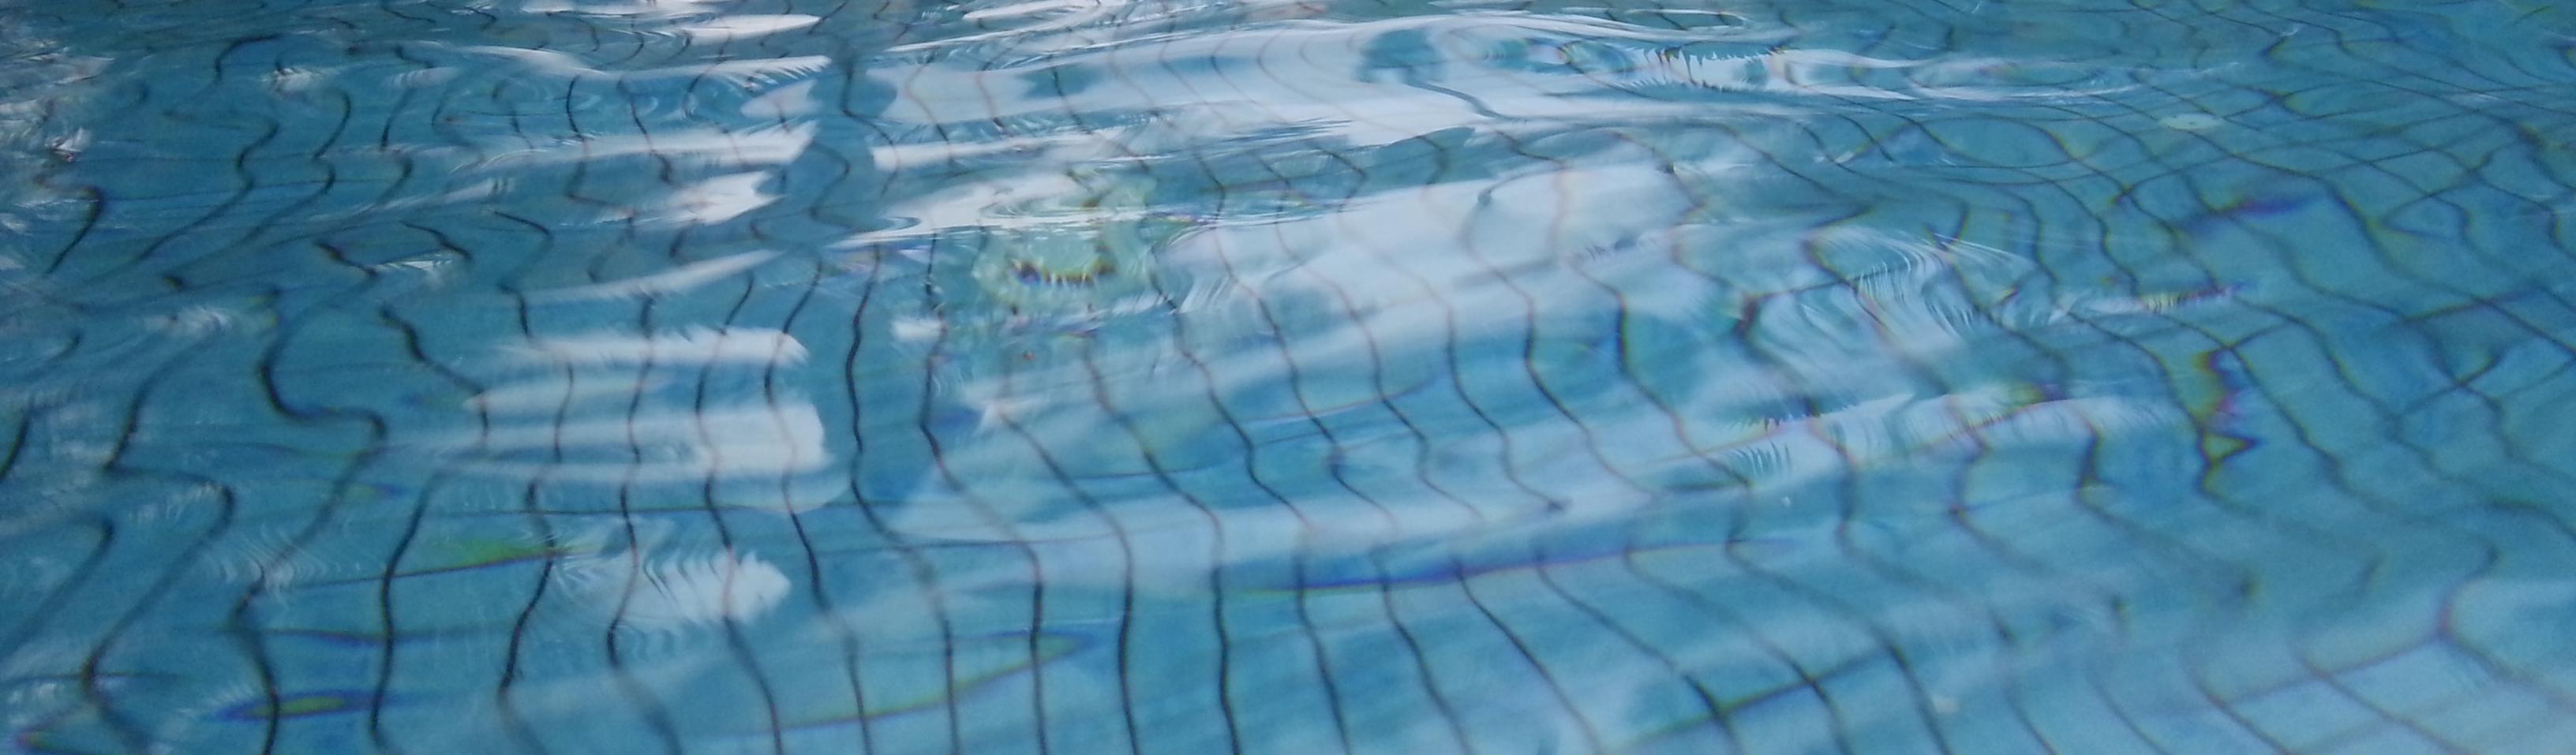 Alina ROBIN, Naturopathe holistique - Hydrothérapie